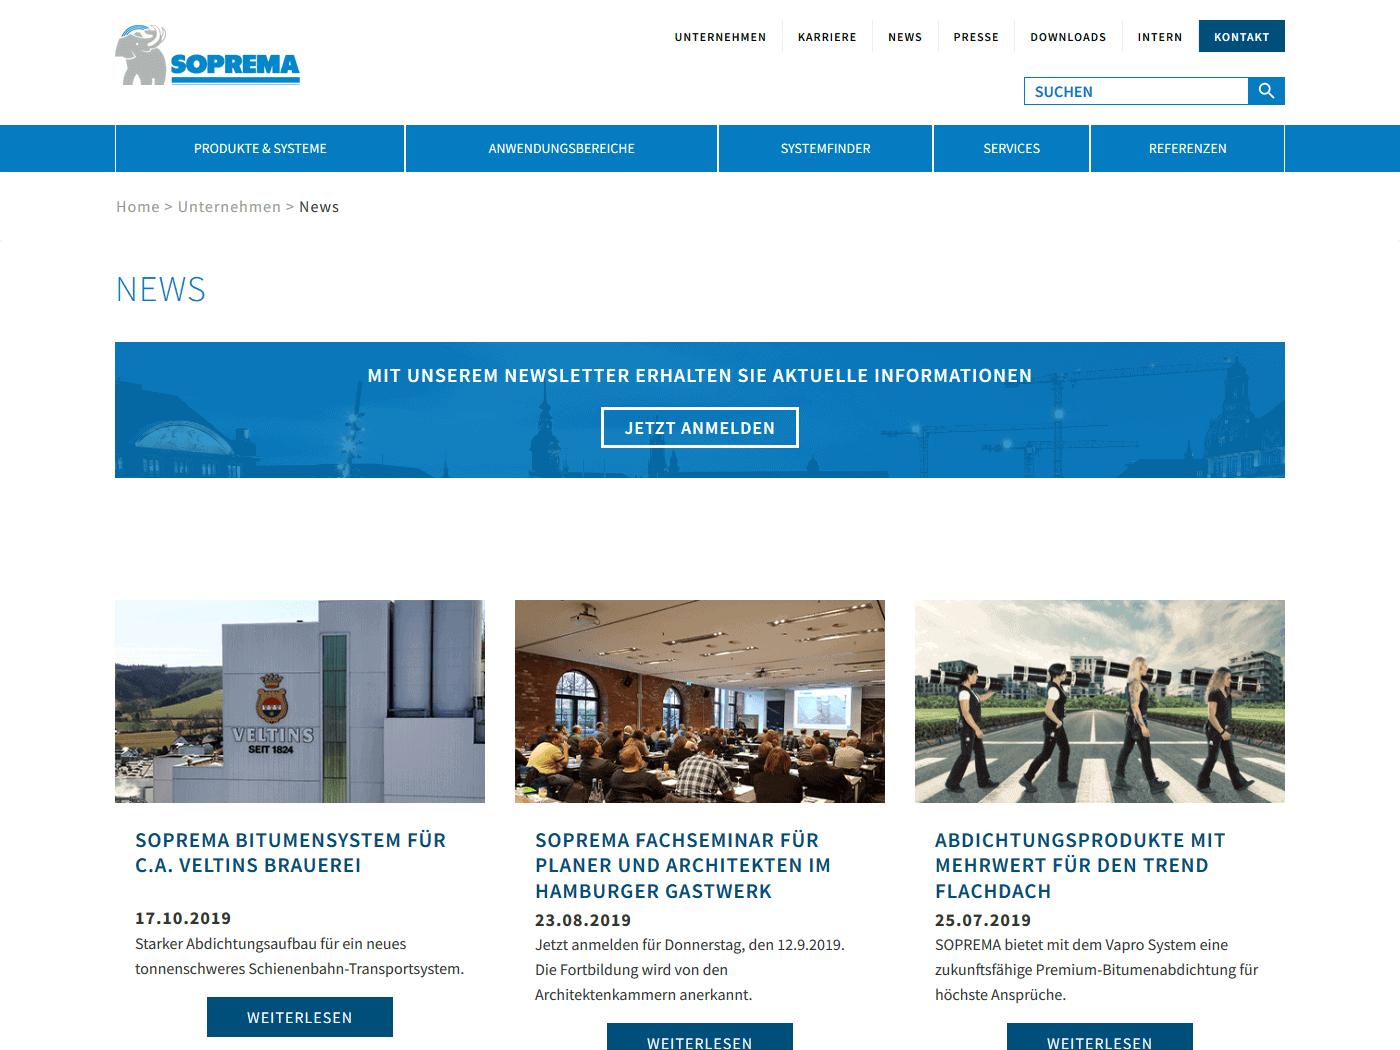 responsive Webdesign Soprema GmbH, News